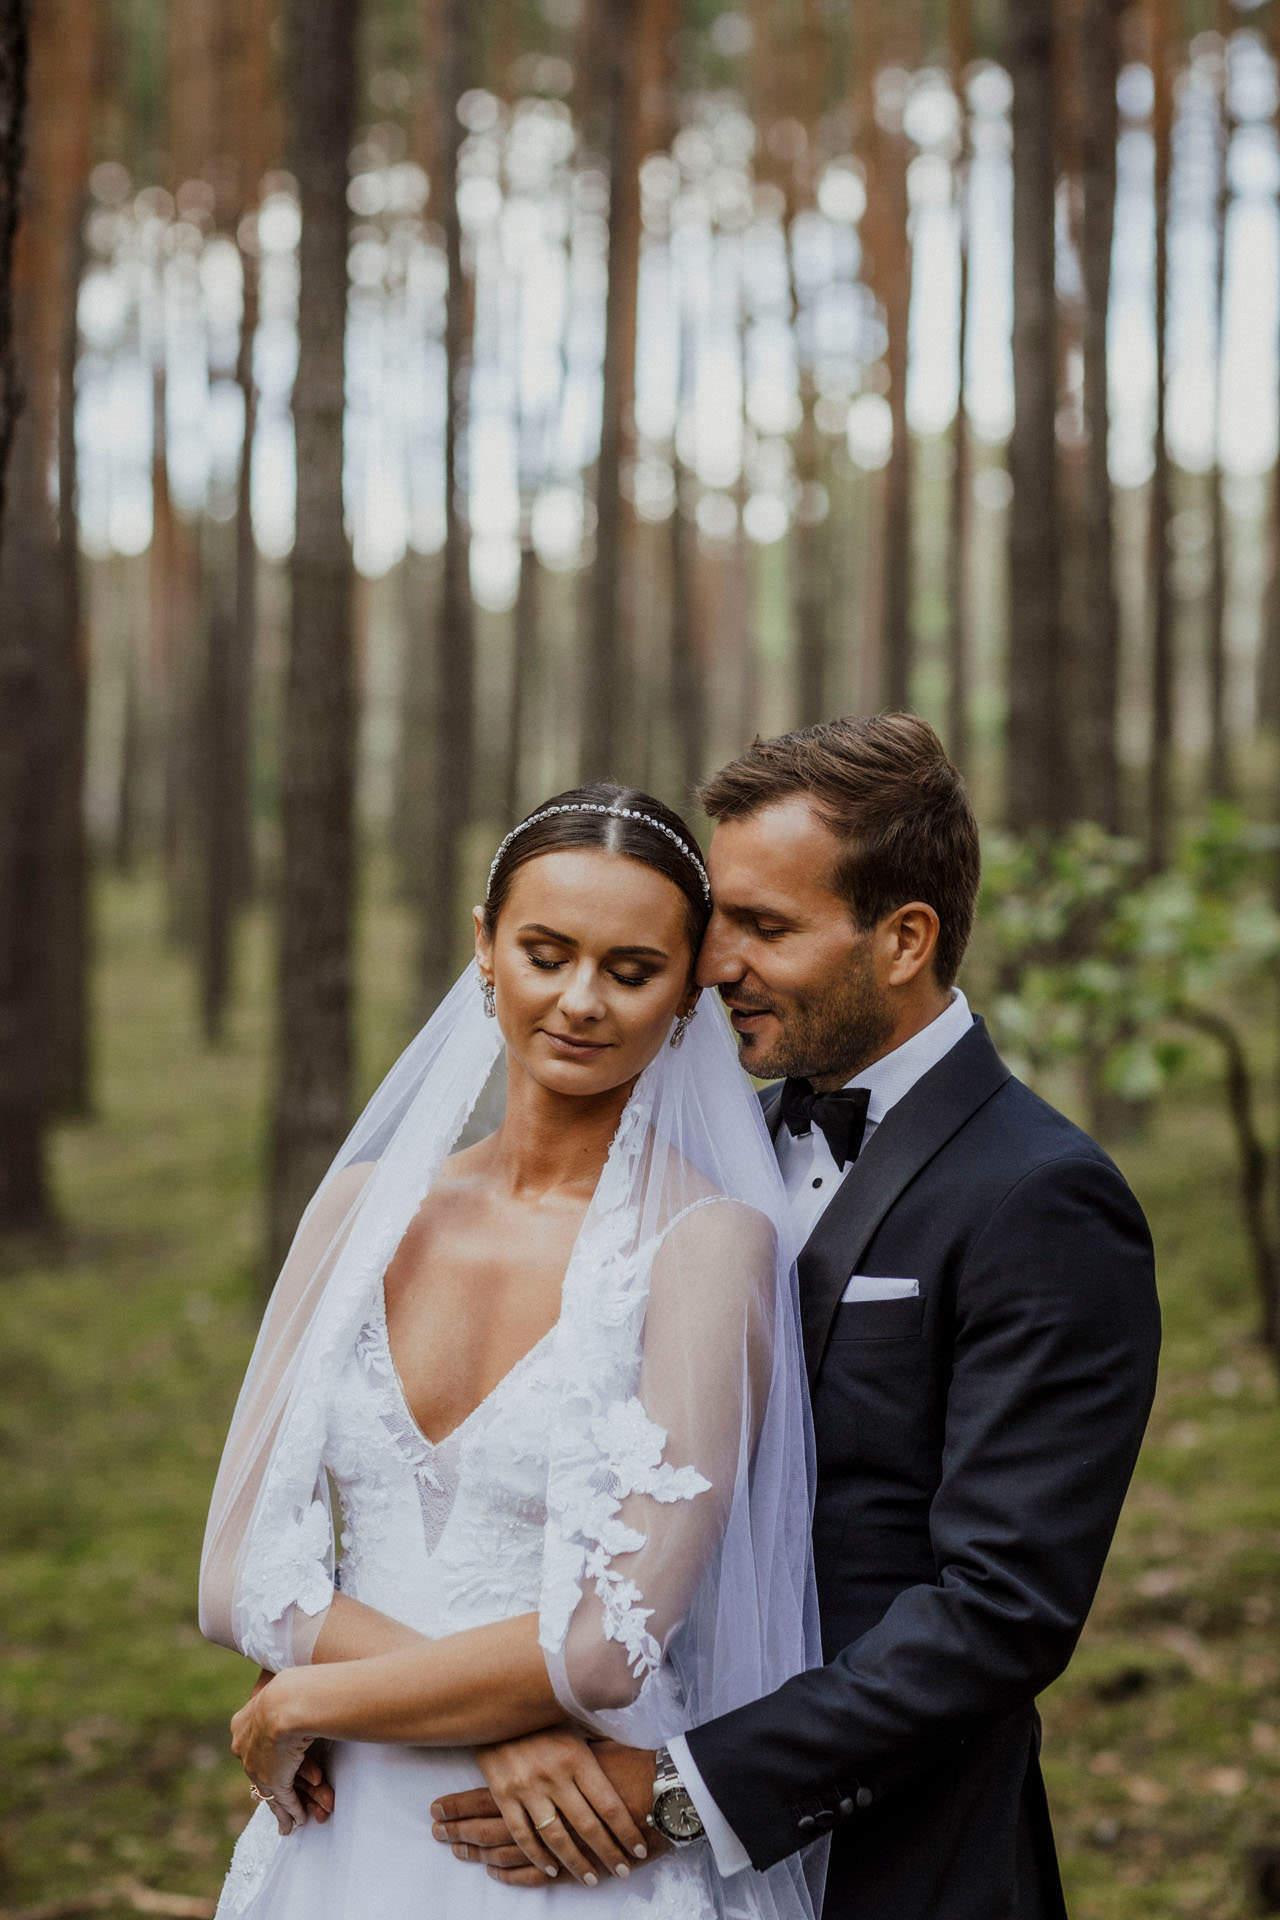 Sara i Tomek warszawski plener slubny w porsche 0025